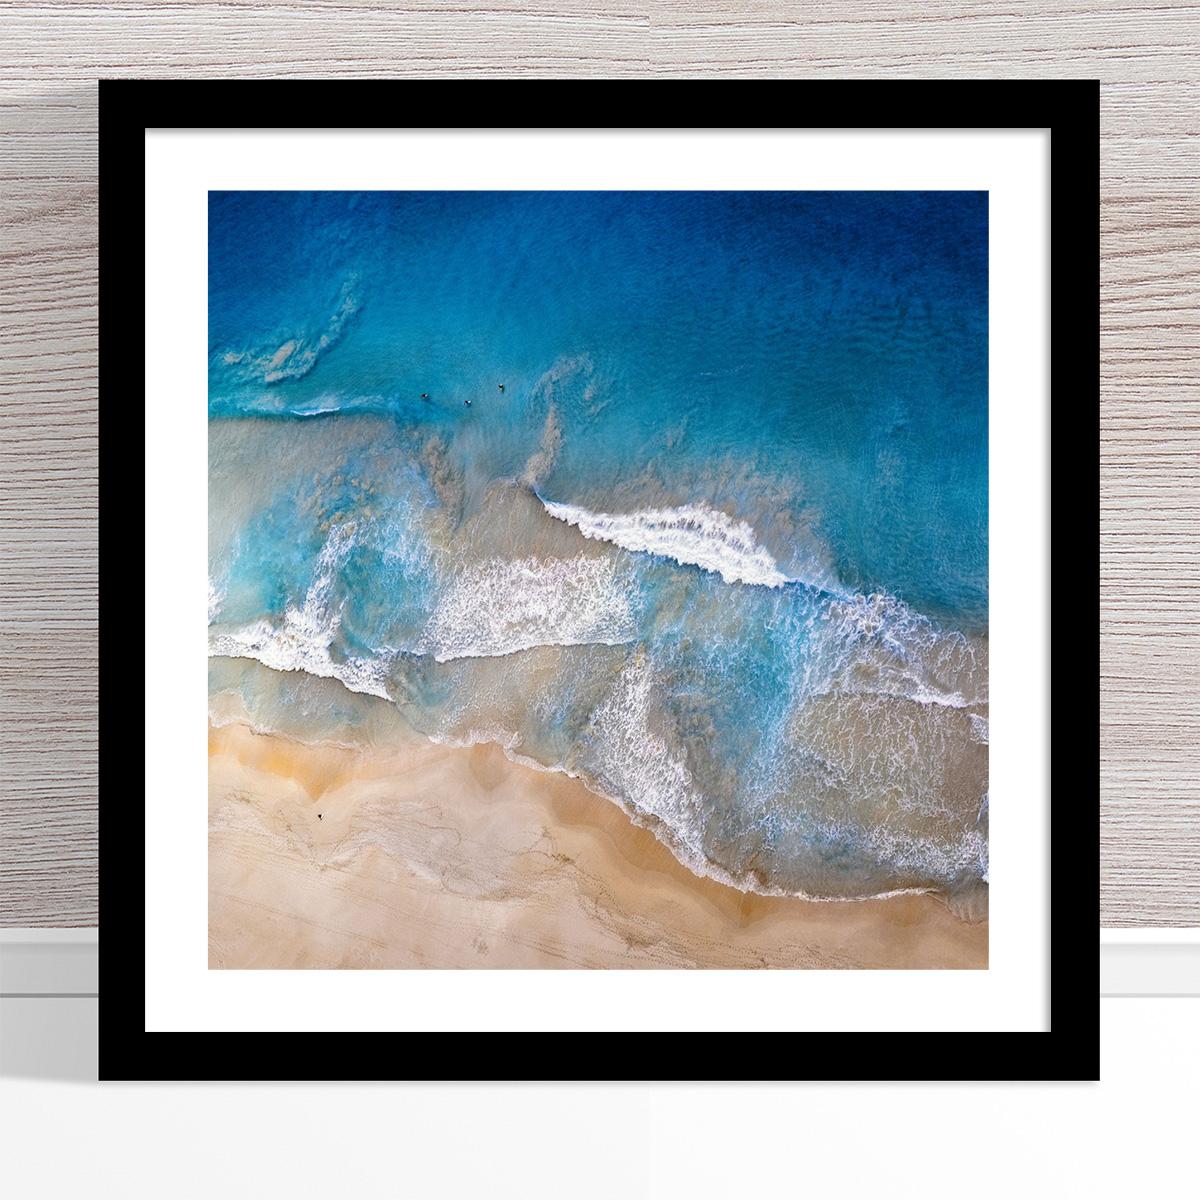 Chris Saunders - 'Aerial Coast 020' Black Frame